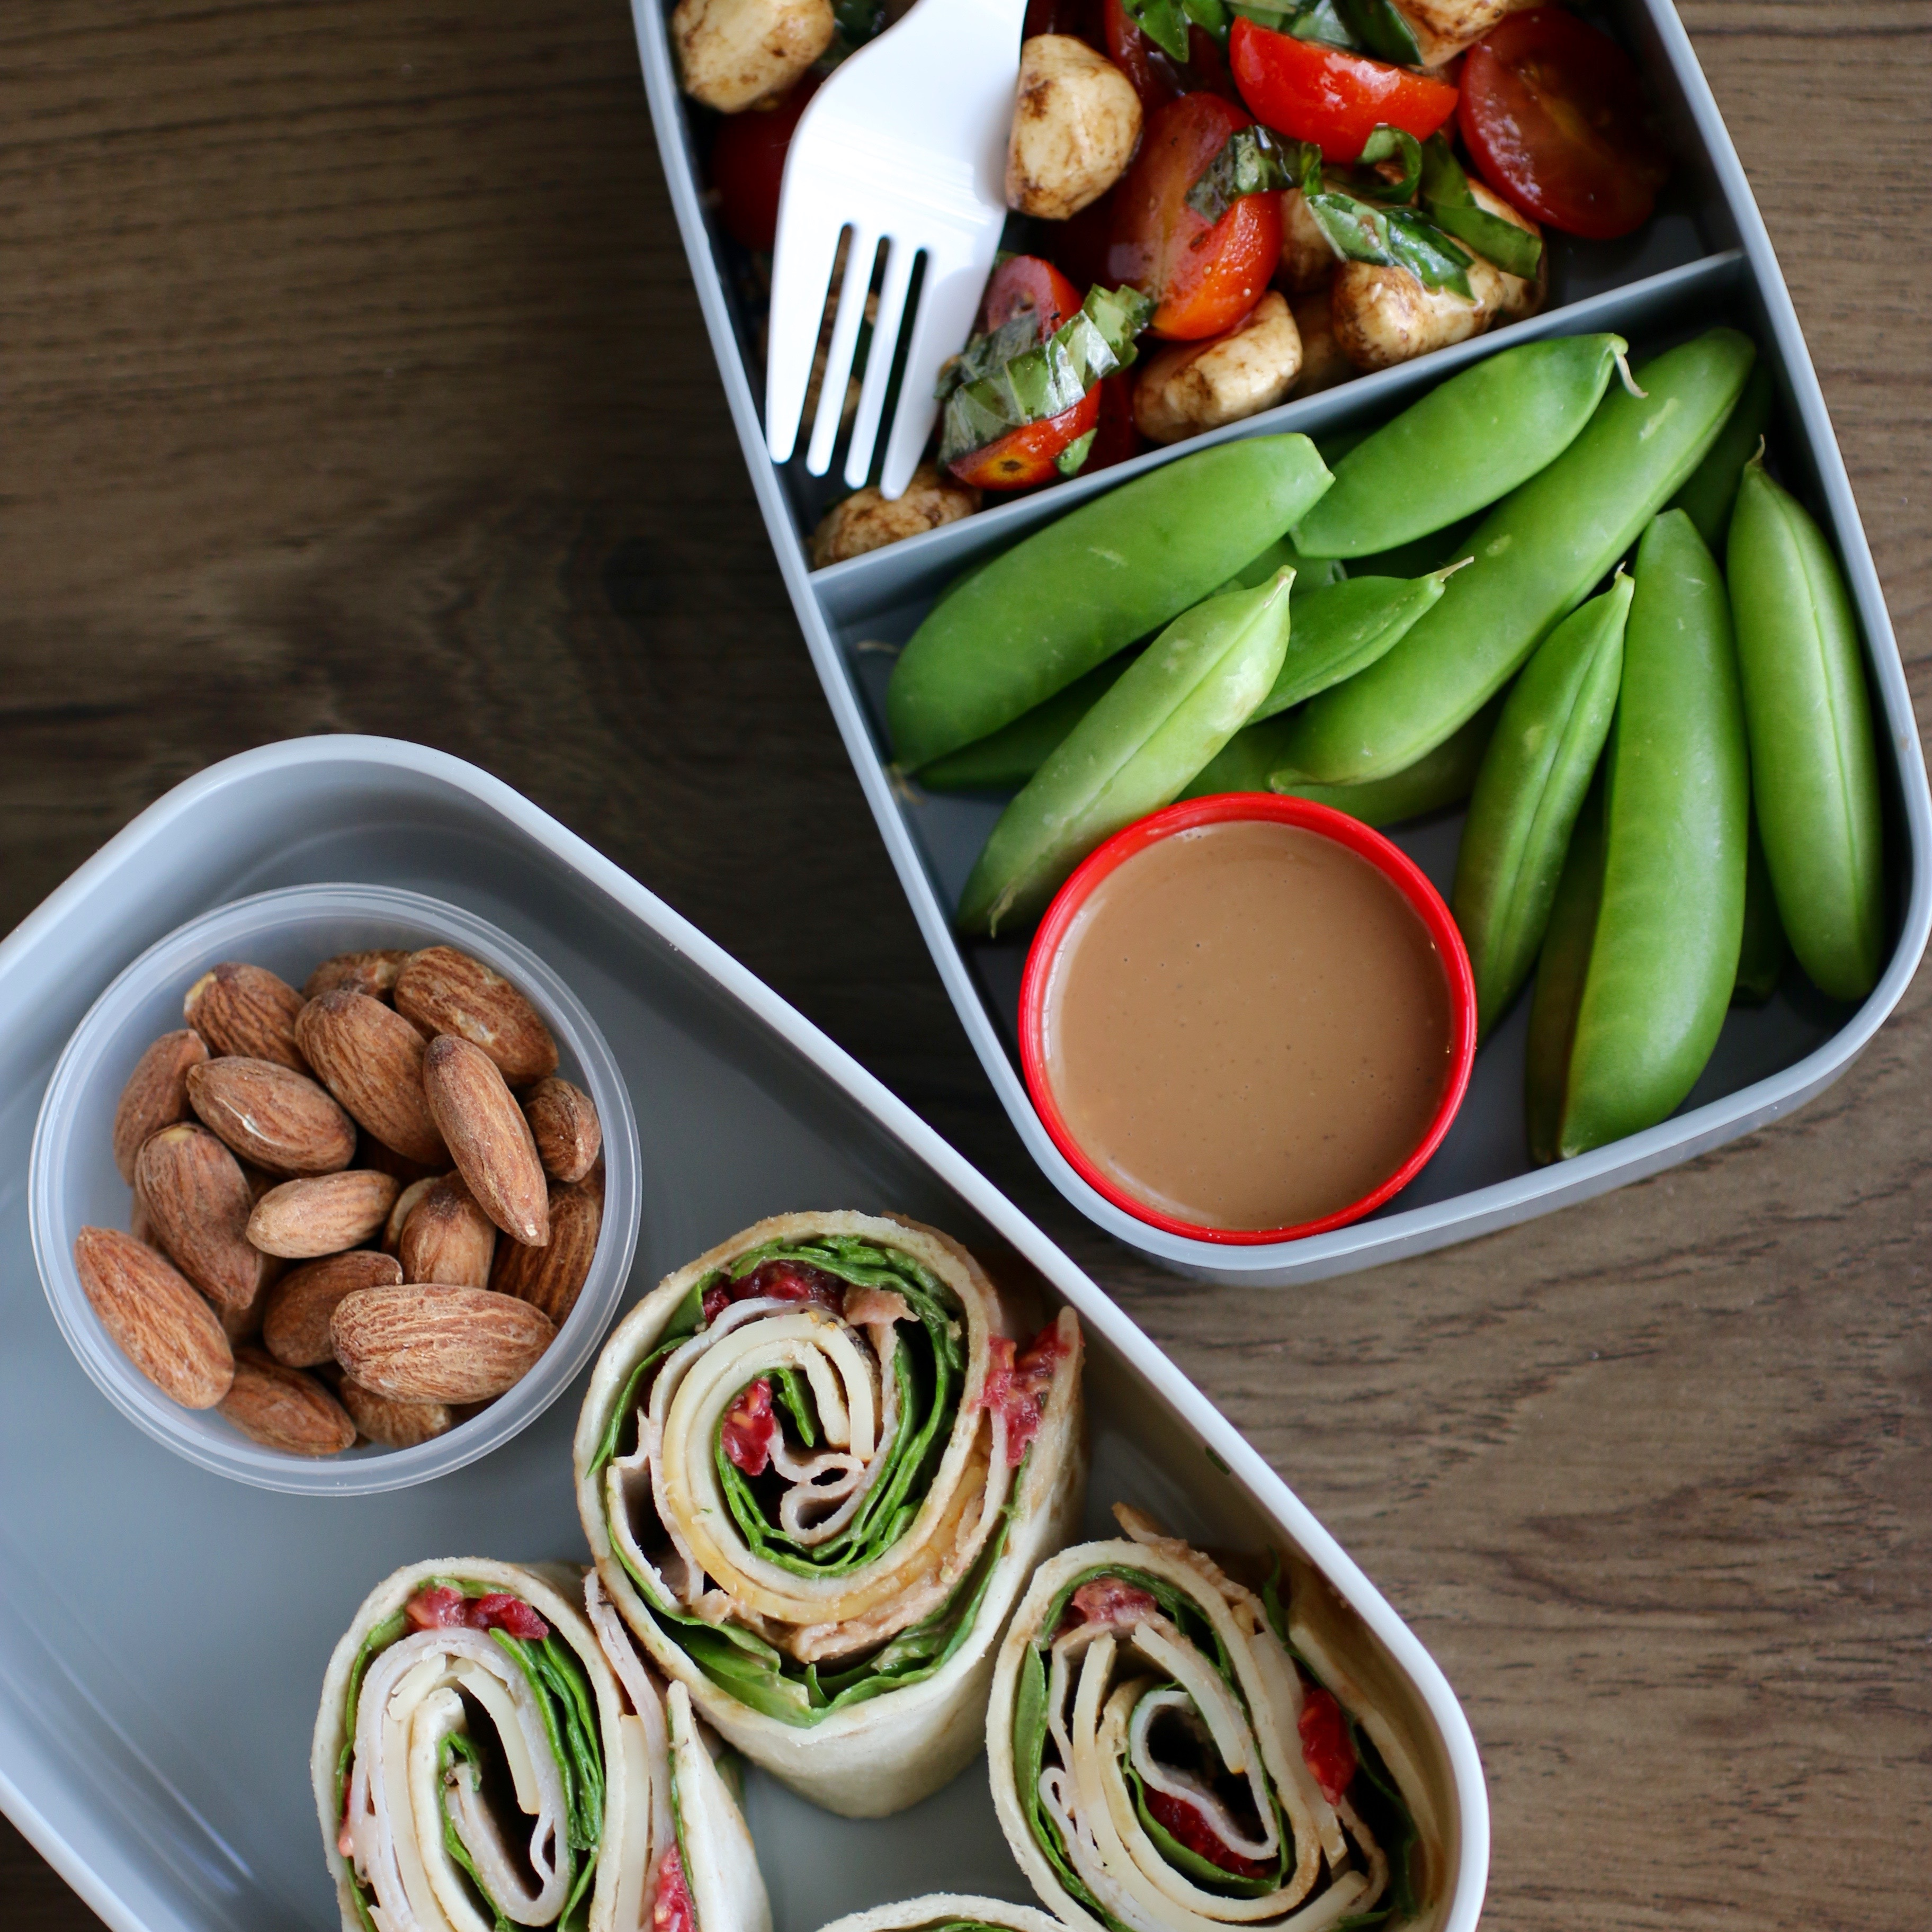 Bento Box Turkey Roll-Ups with Caprese Salad My Hot Southern Mess